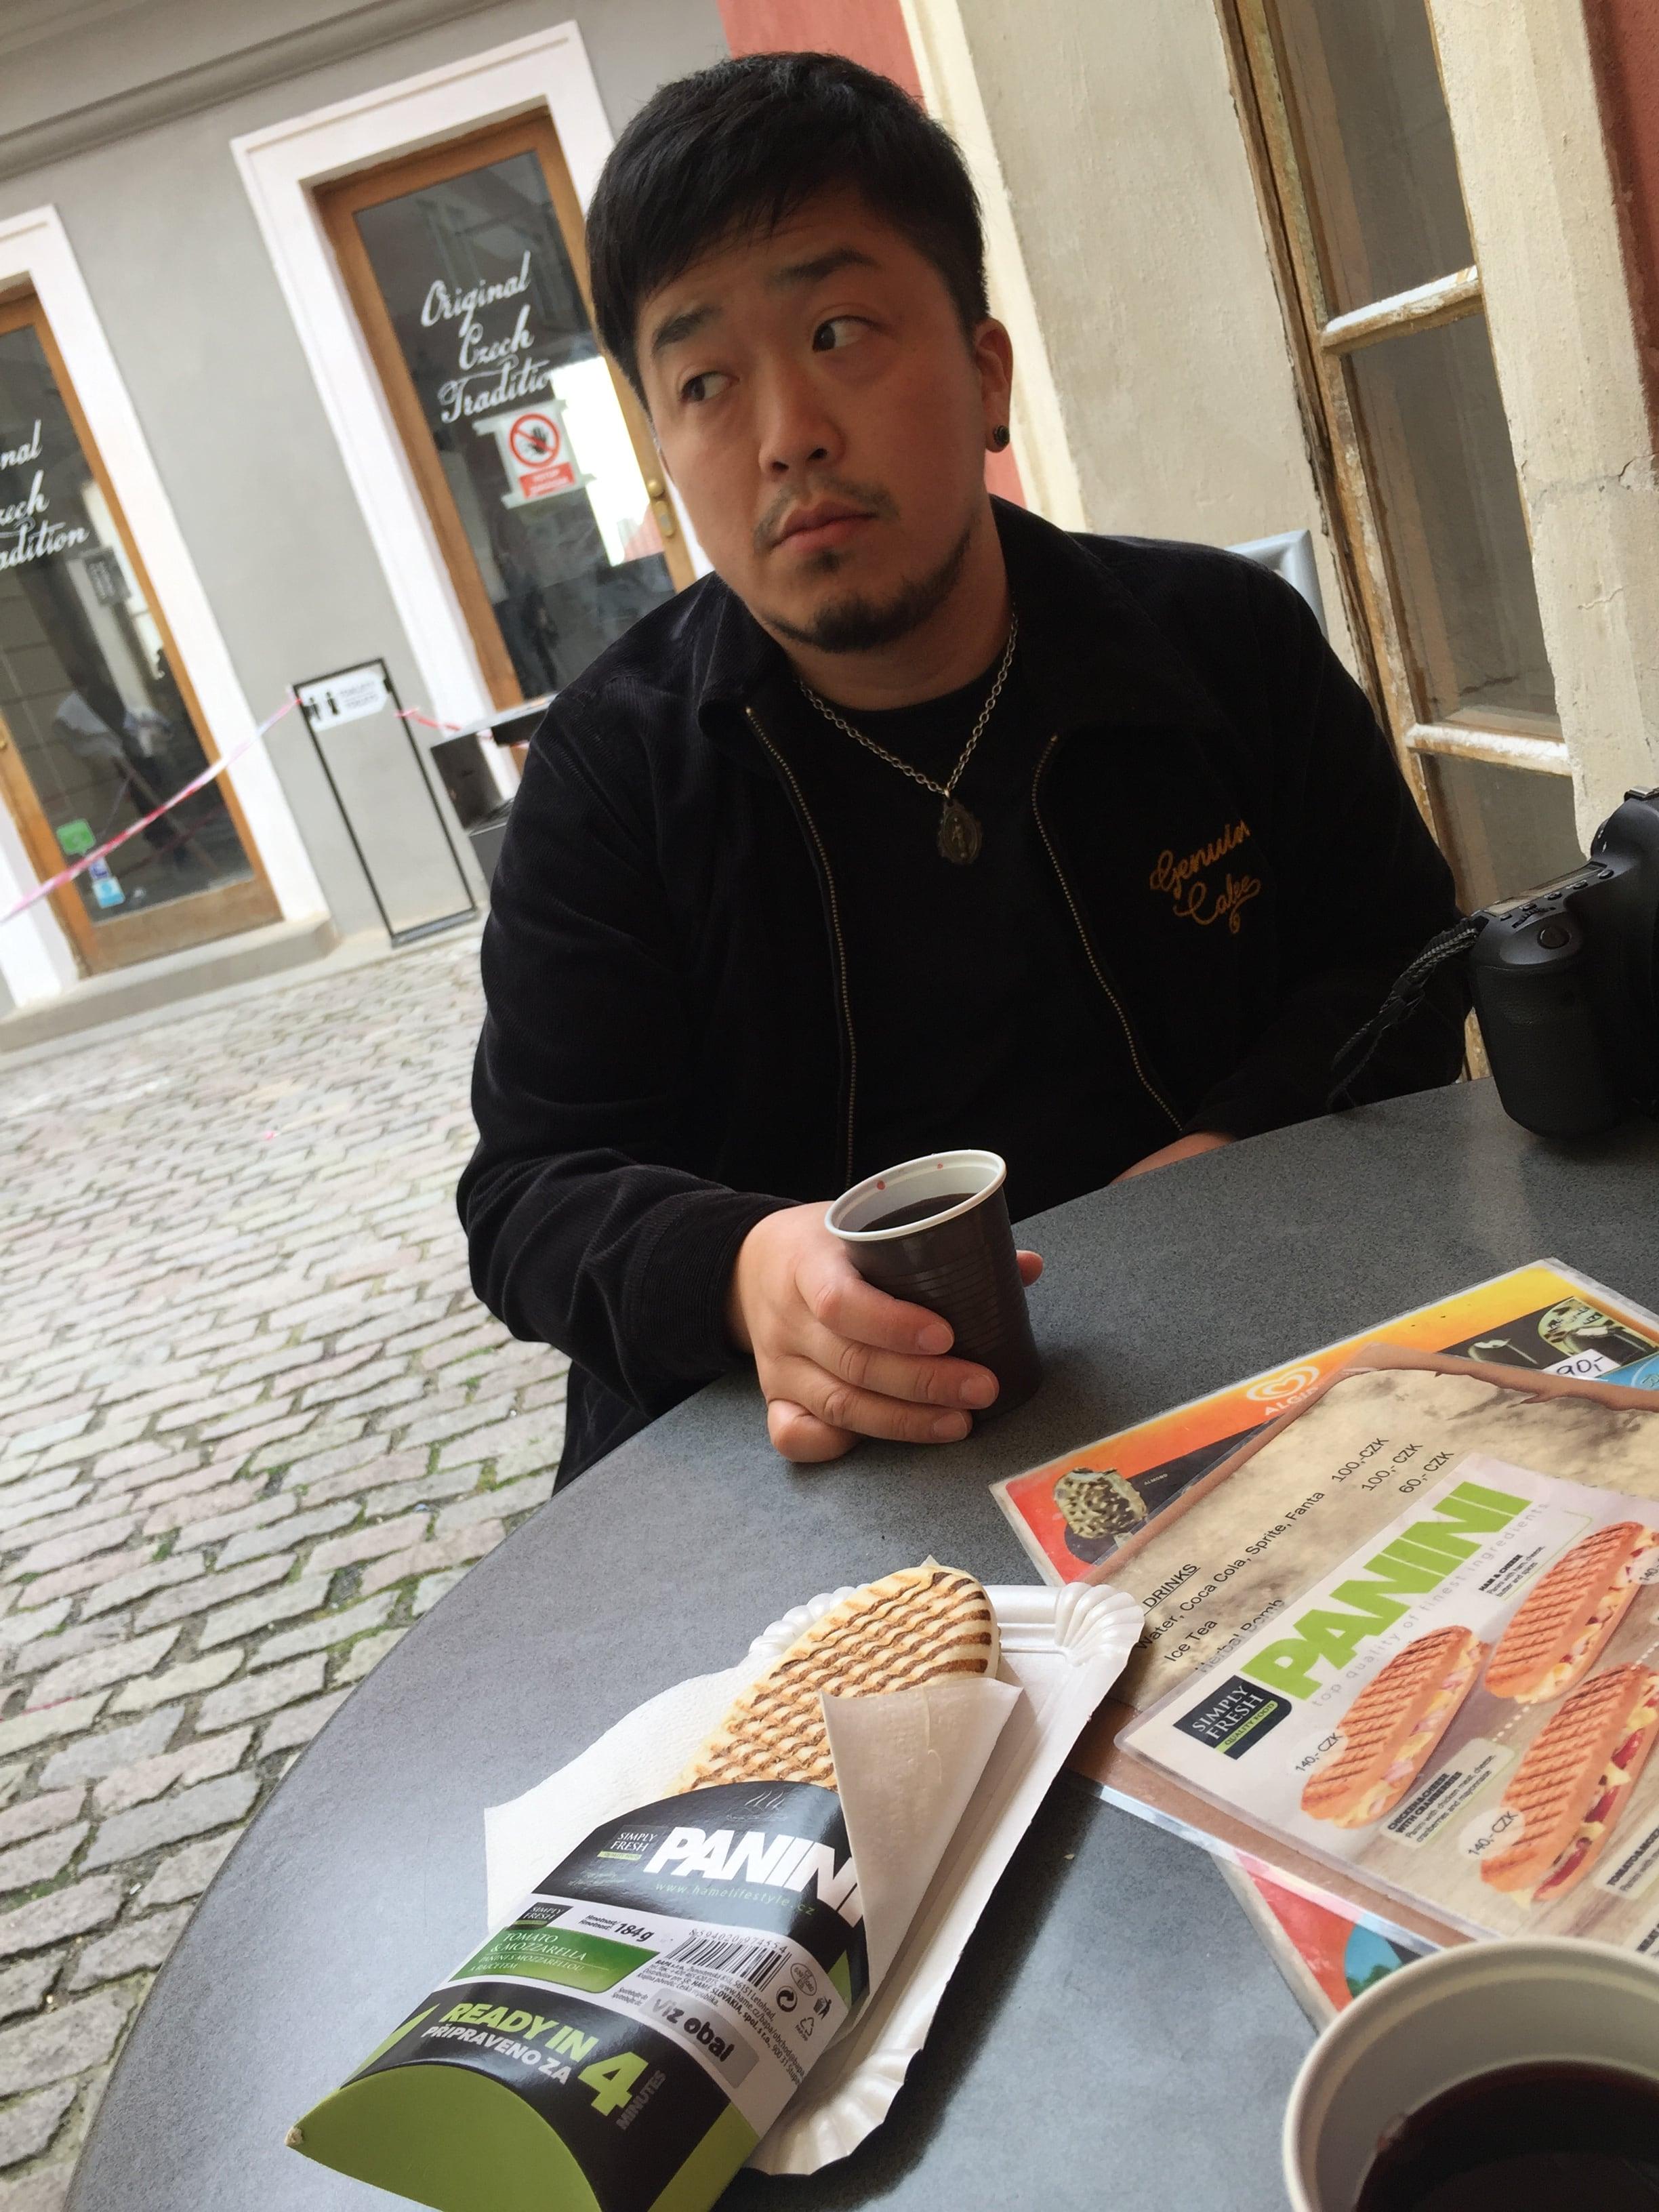 Photo 2017-09-21 20 55 21-min